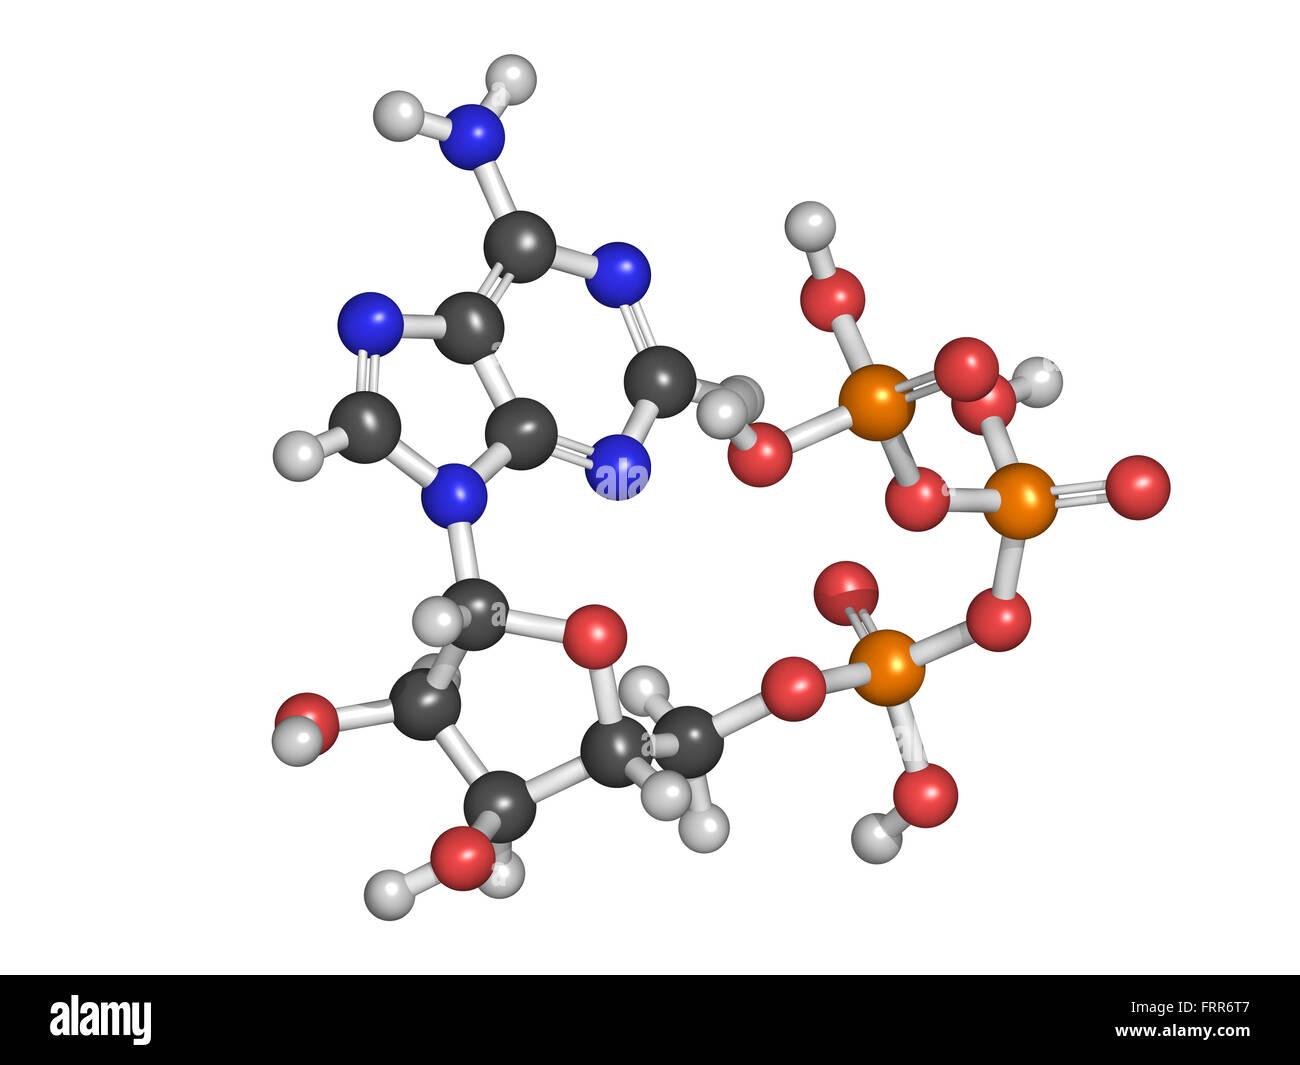 adp molecule diagram labeled suzuki cultus car electrical wiring atp stock photos and images alamy